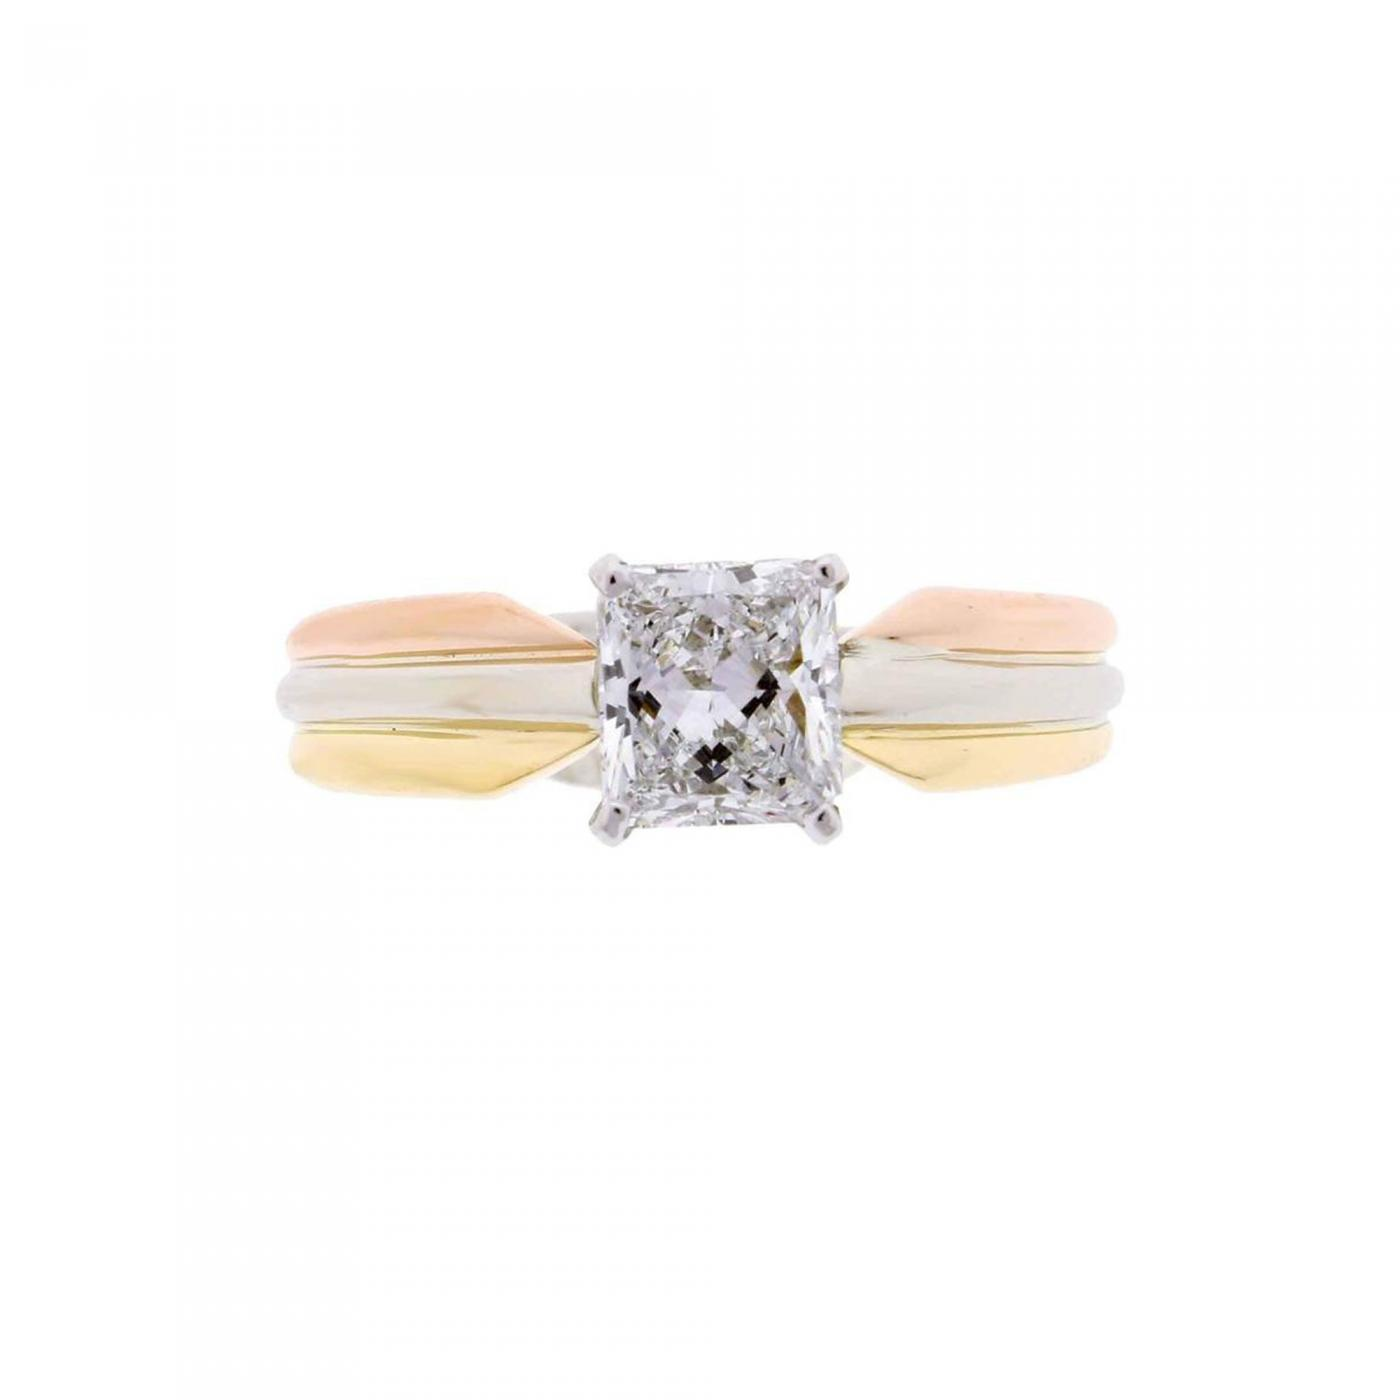 5a865ef44eadb Cartier - Cartier Trinity Radiant Diamond Gold Platinum Engagement Ring